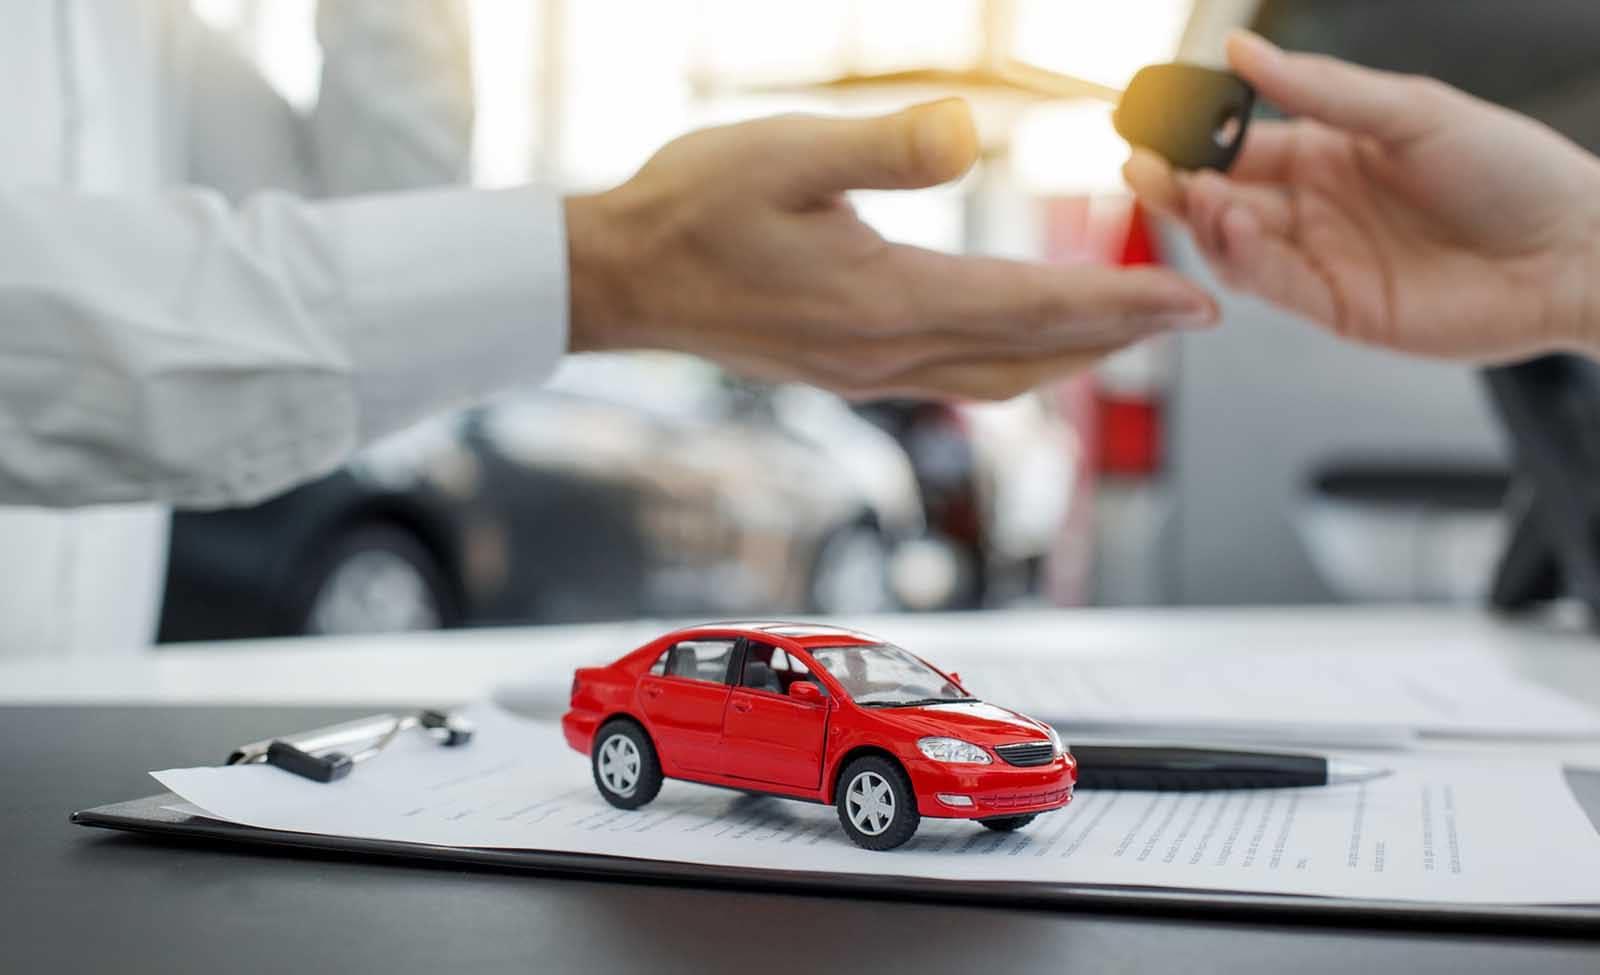 guest handing key to dealer